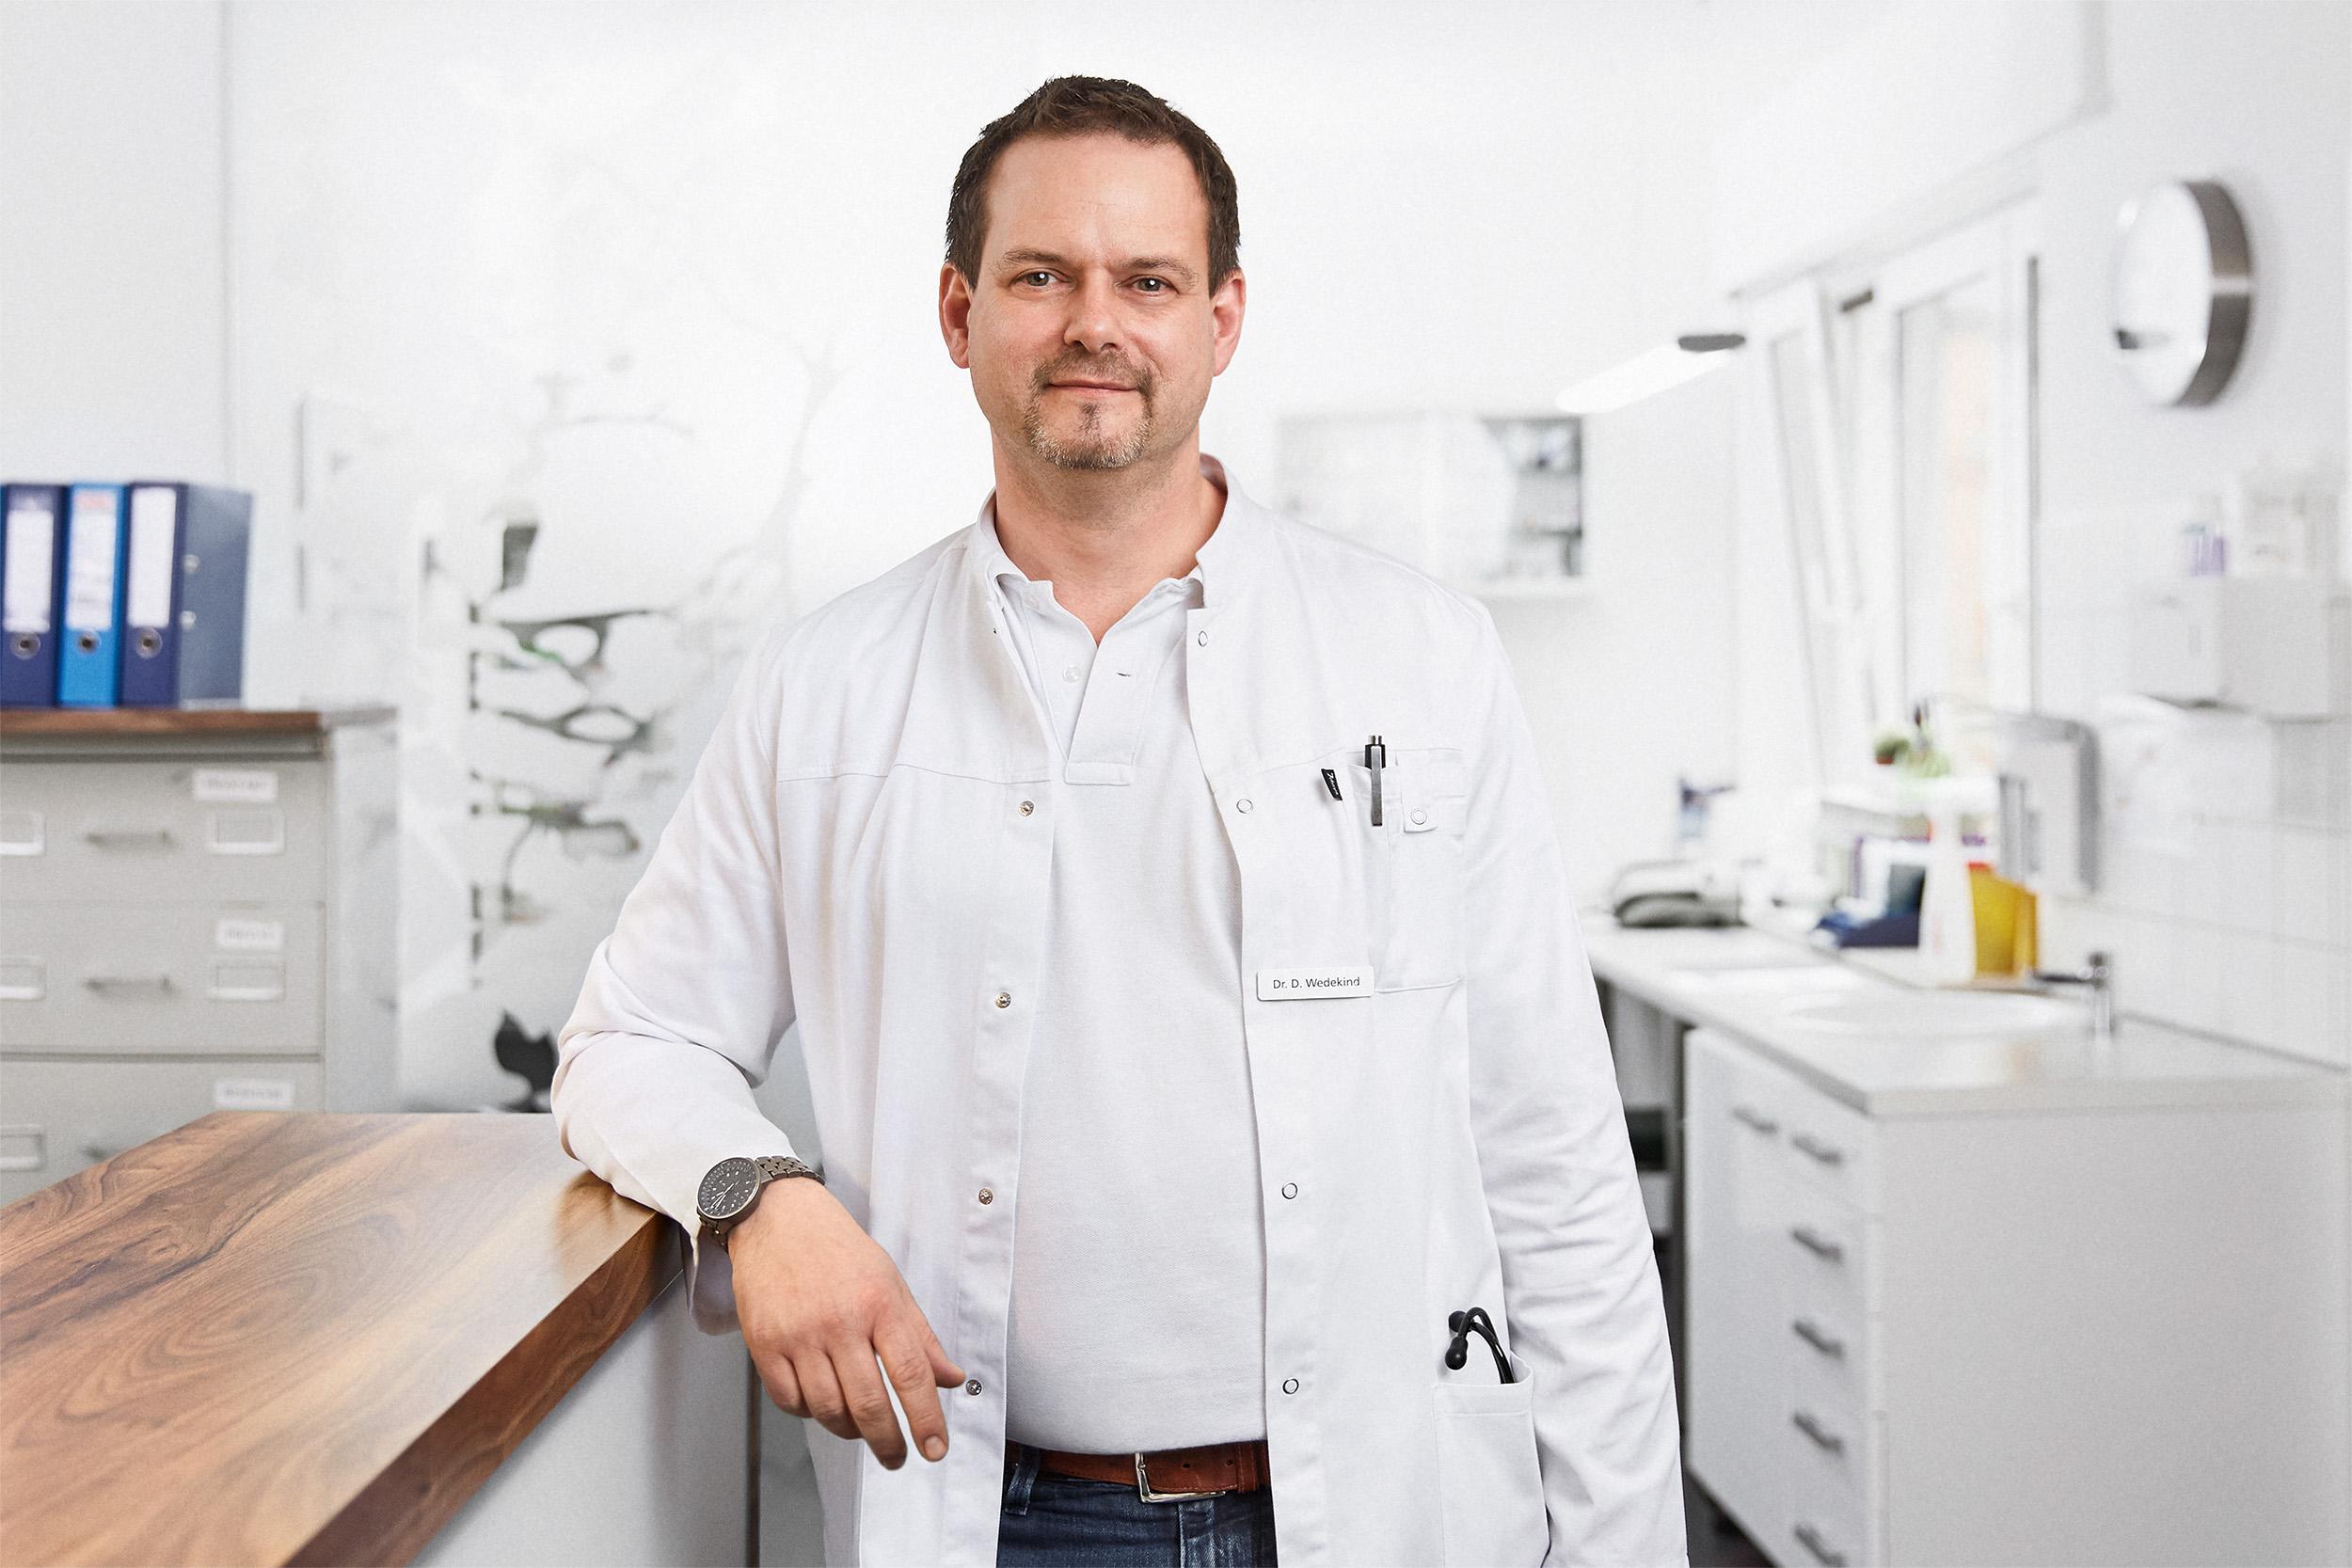 Dr. Wedekind